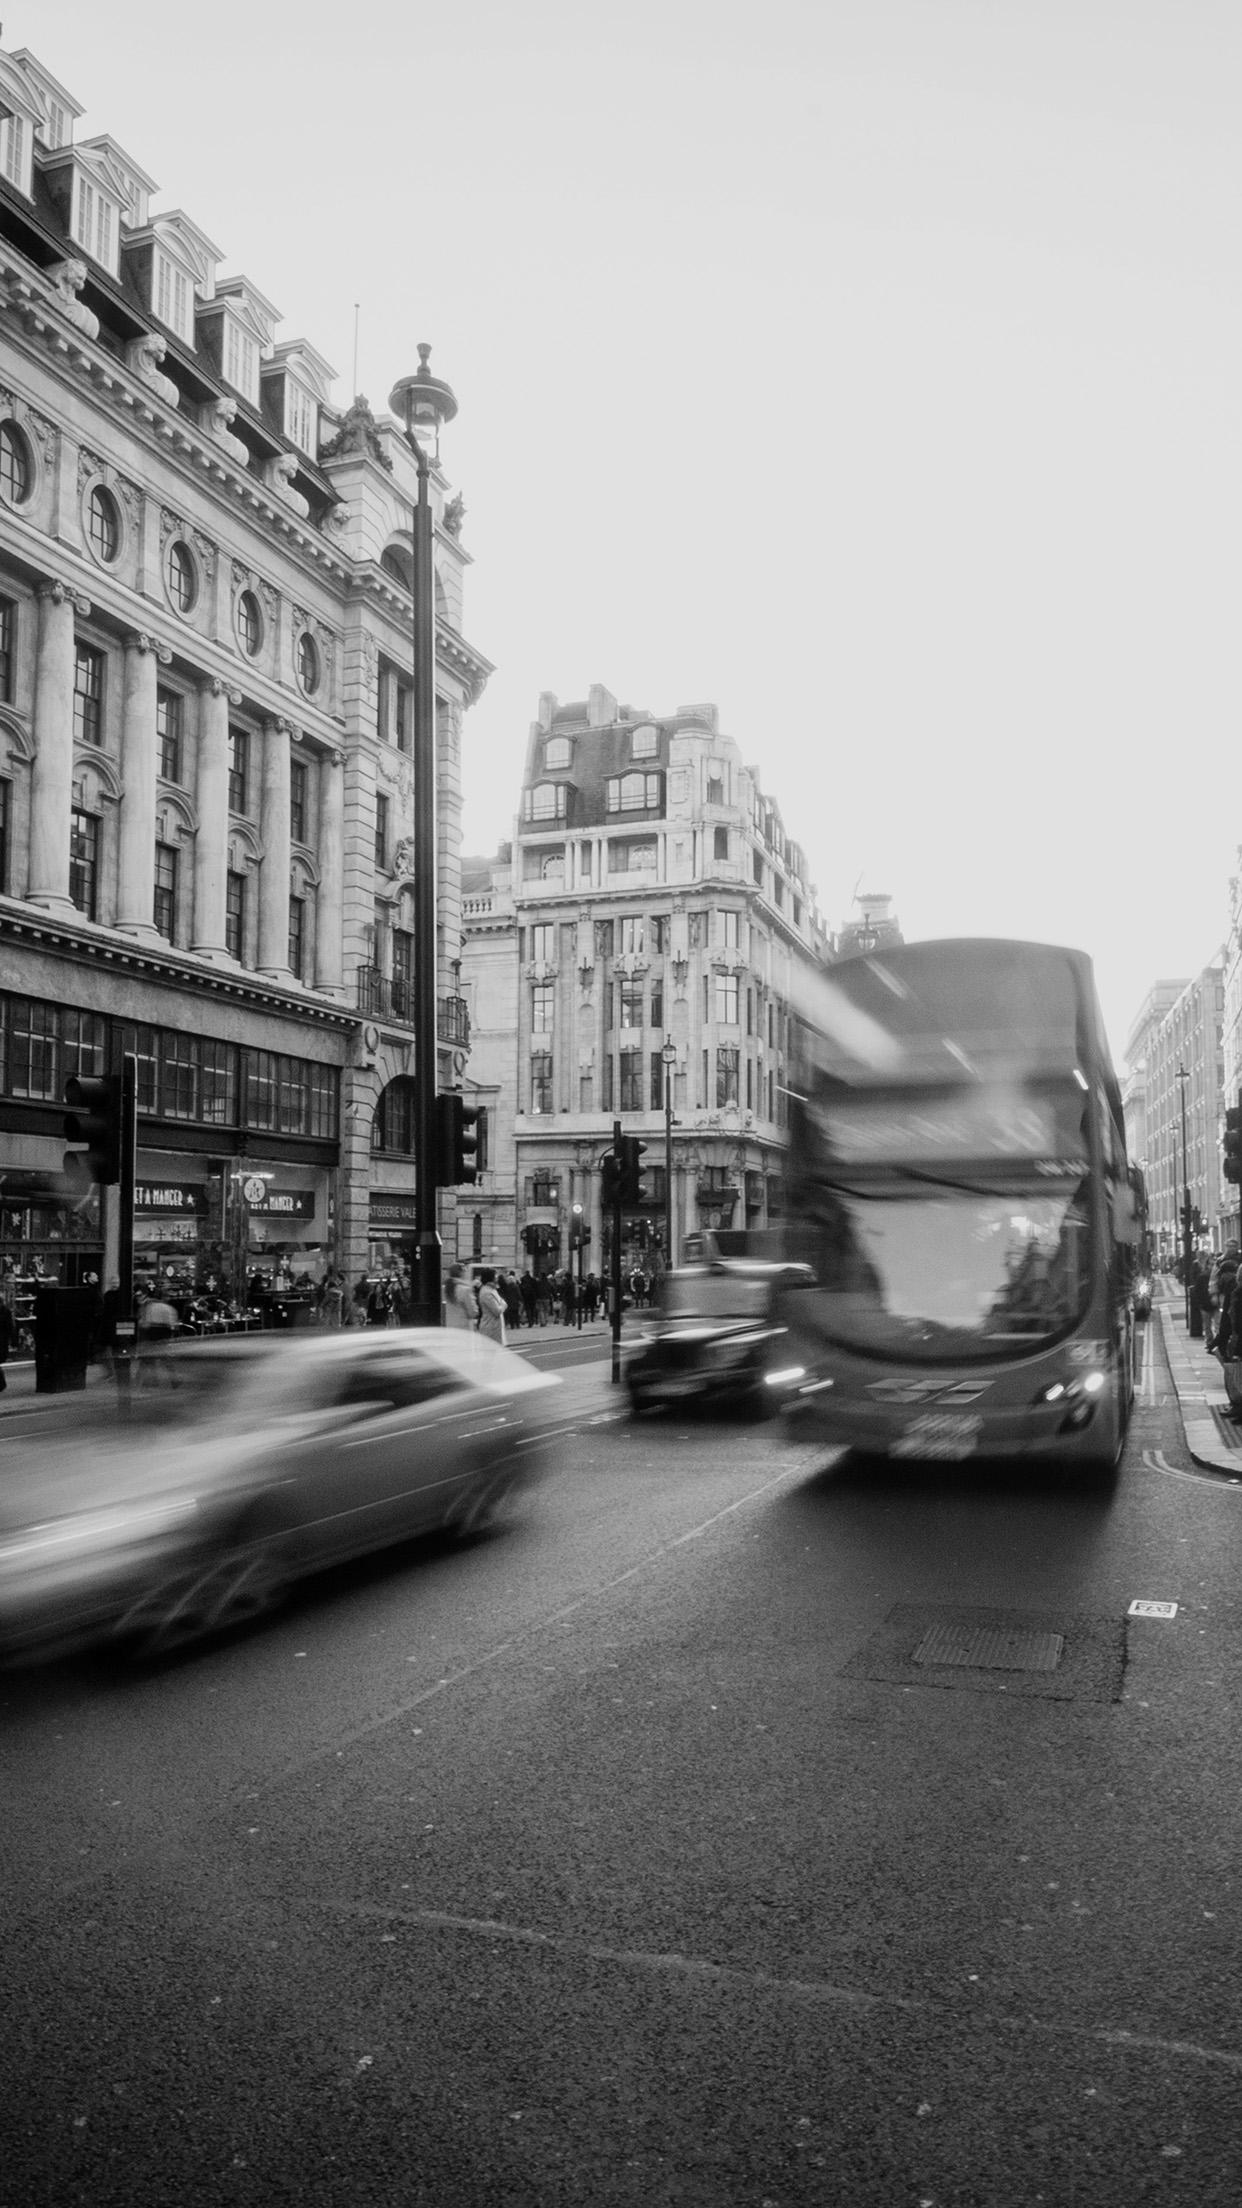 Papersco Iphone Wallpaper Mu61 London City Street